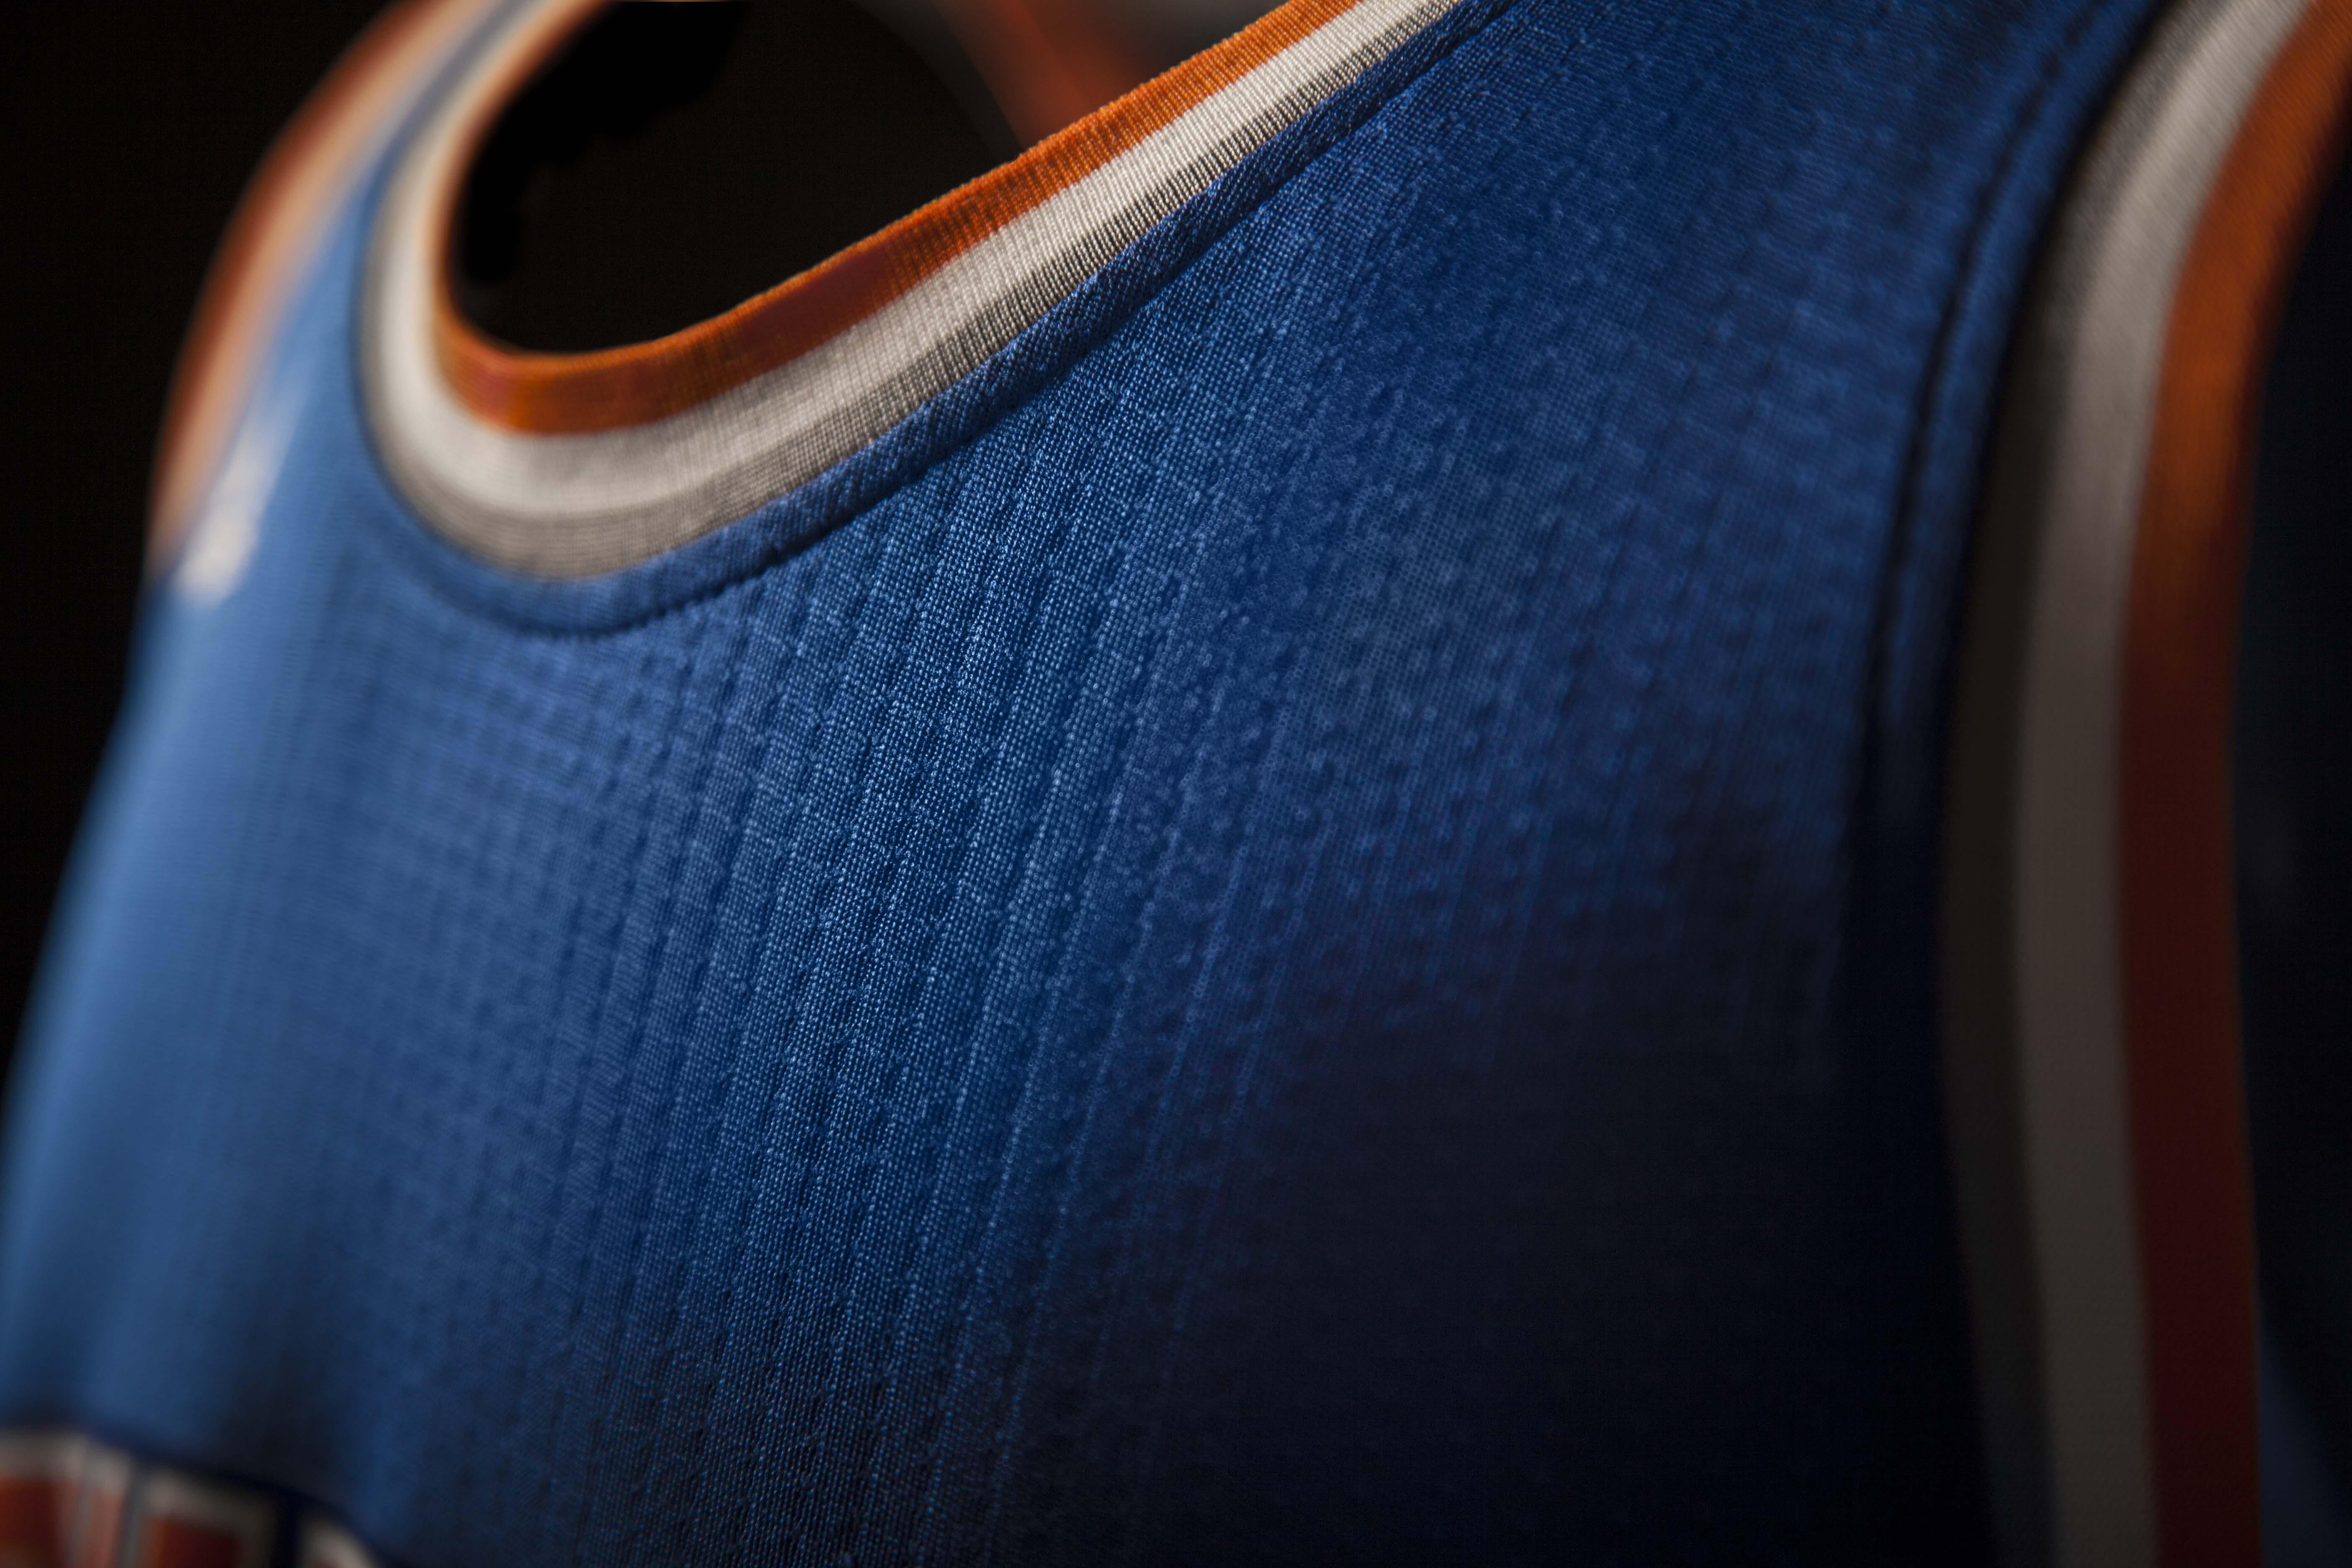 FW14_NBA_Jerseys_Knicks_Detail2